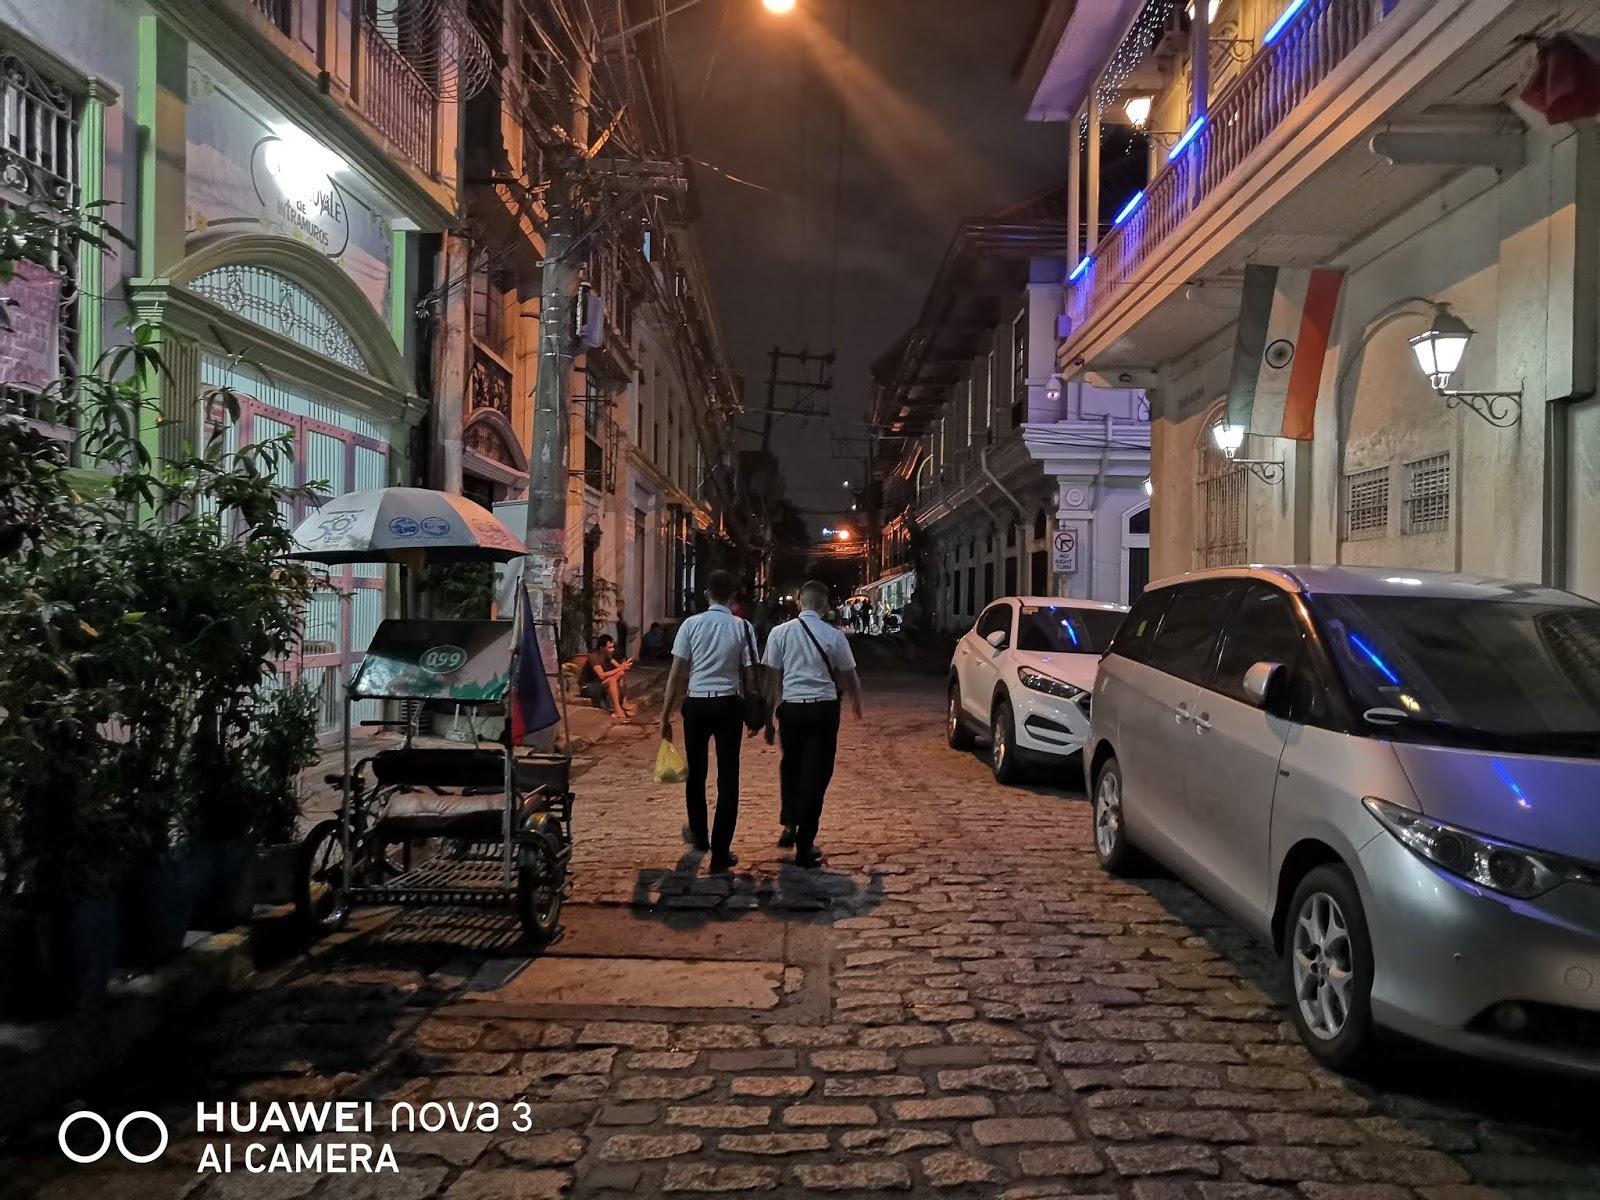 Huawei Nova 3 Sample Low Light Capture